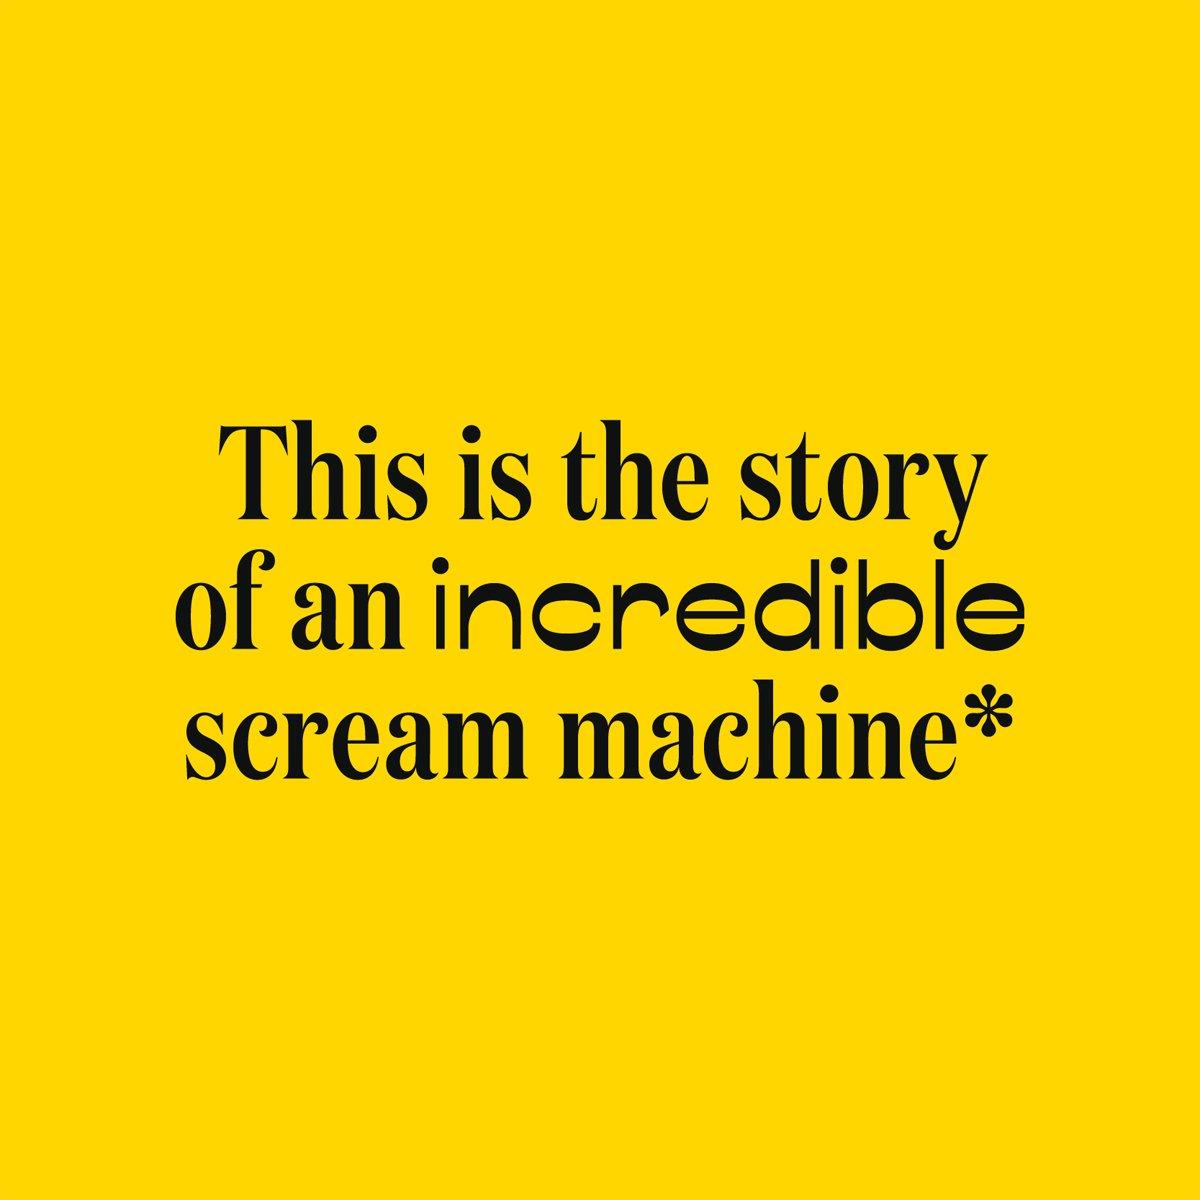 incredible scream machine